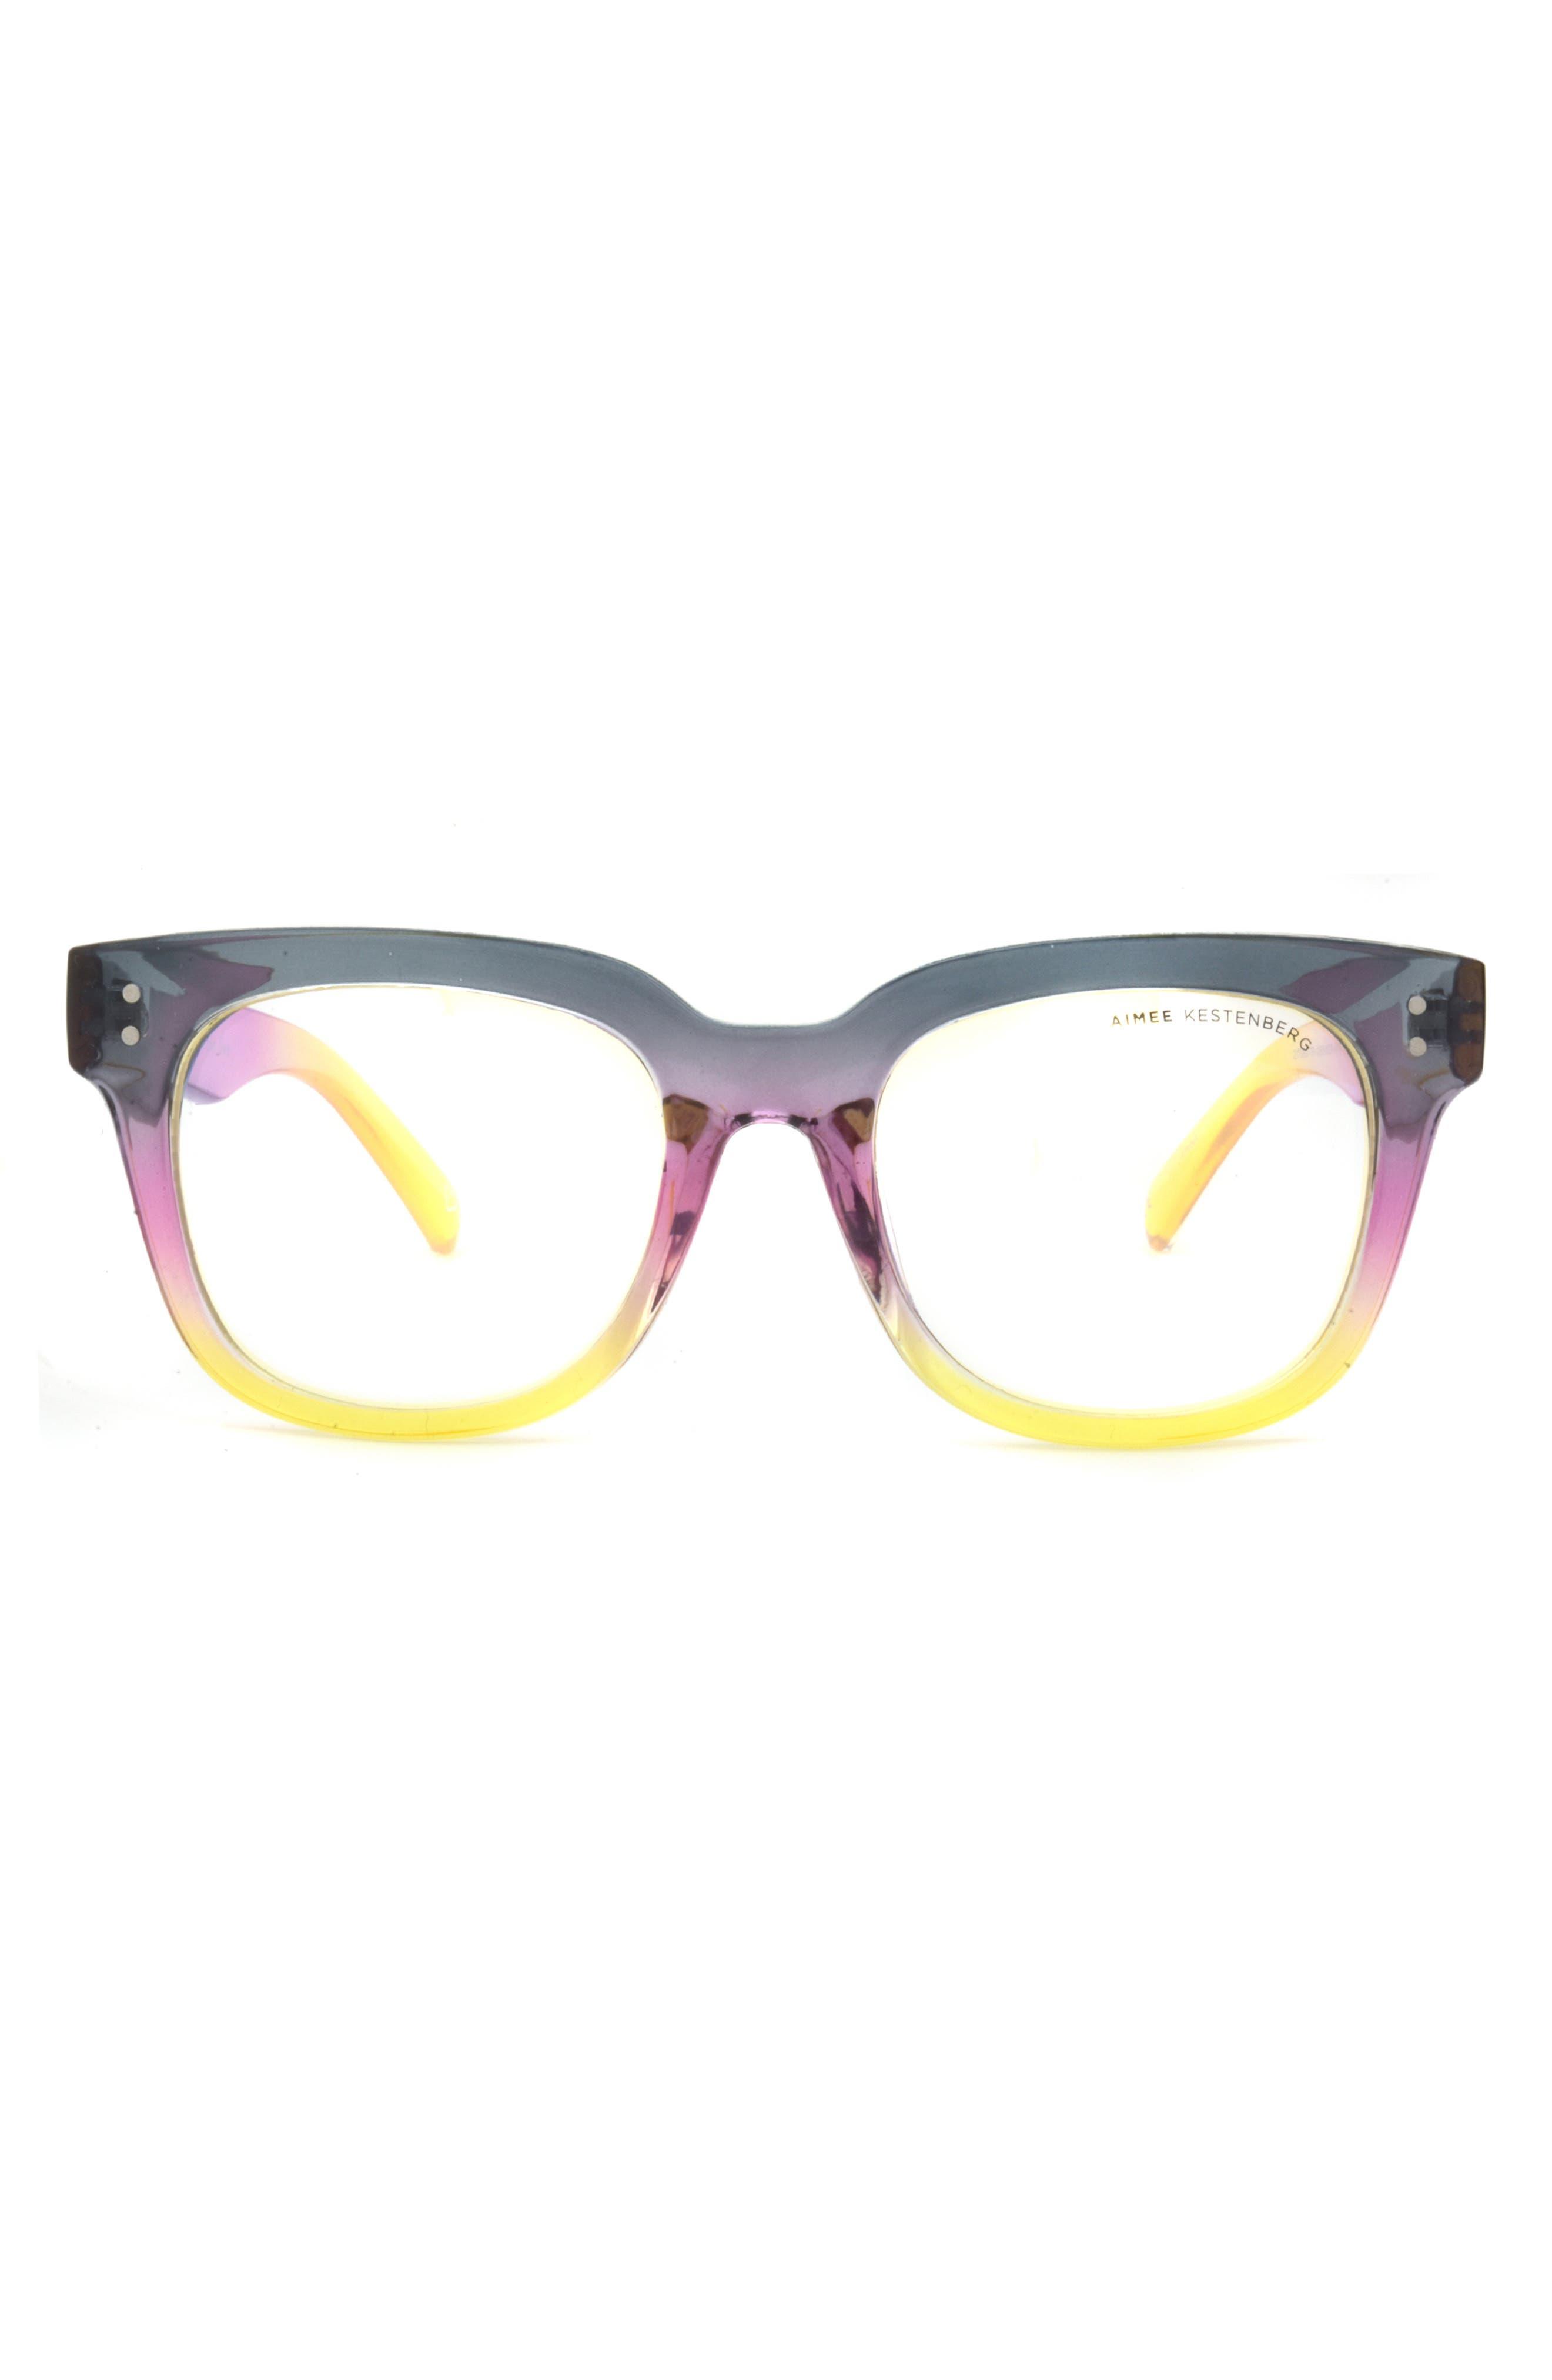 Houston 52mm Square Blue Light Blocking Glasses